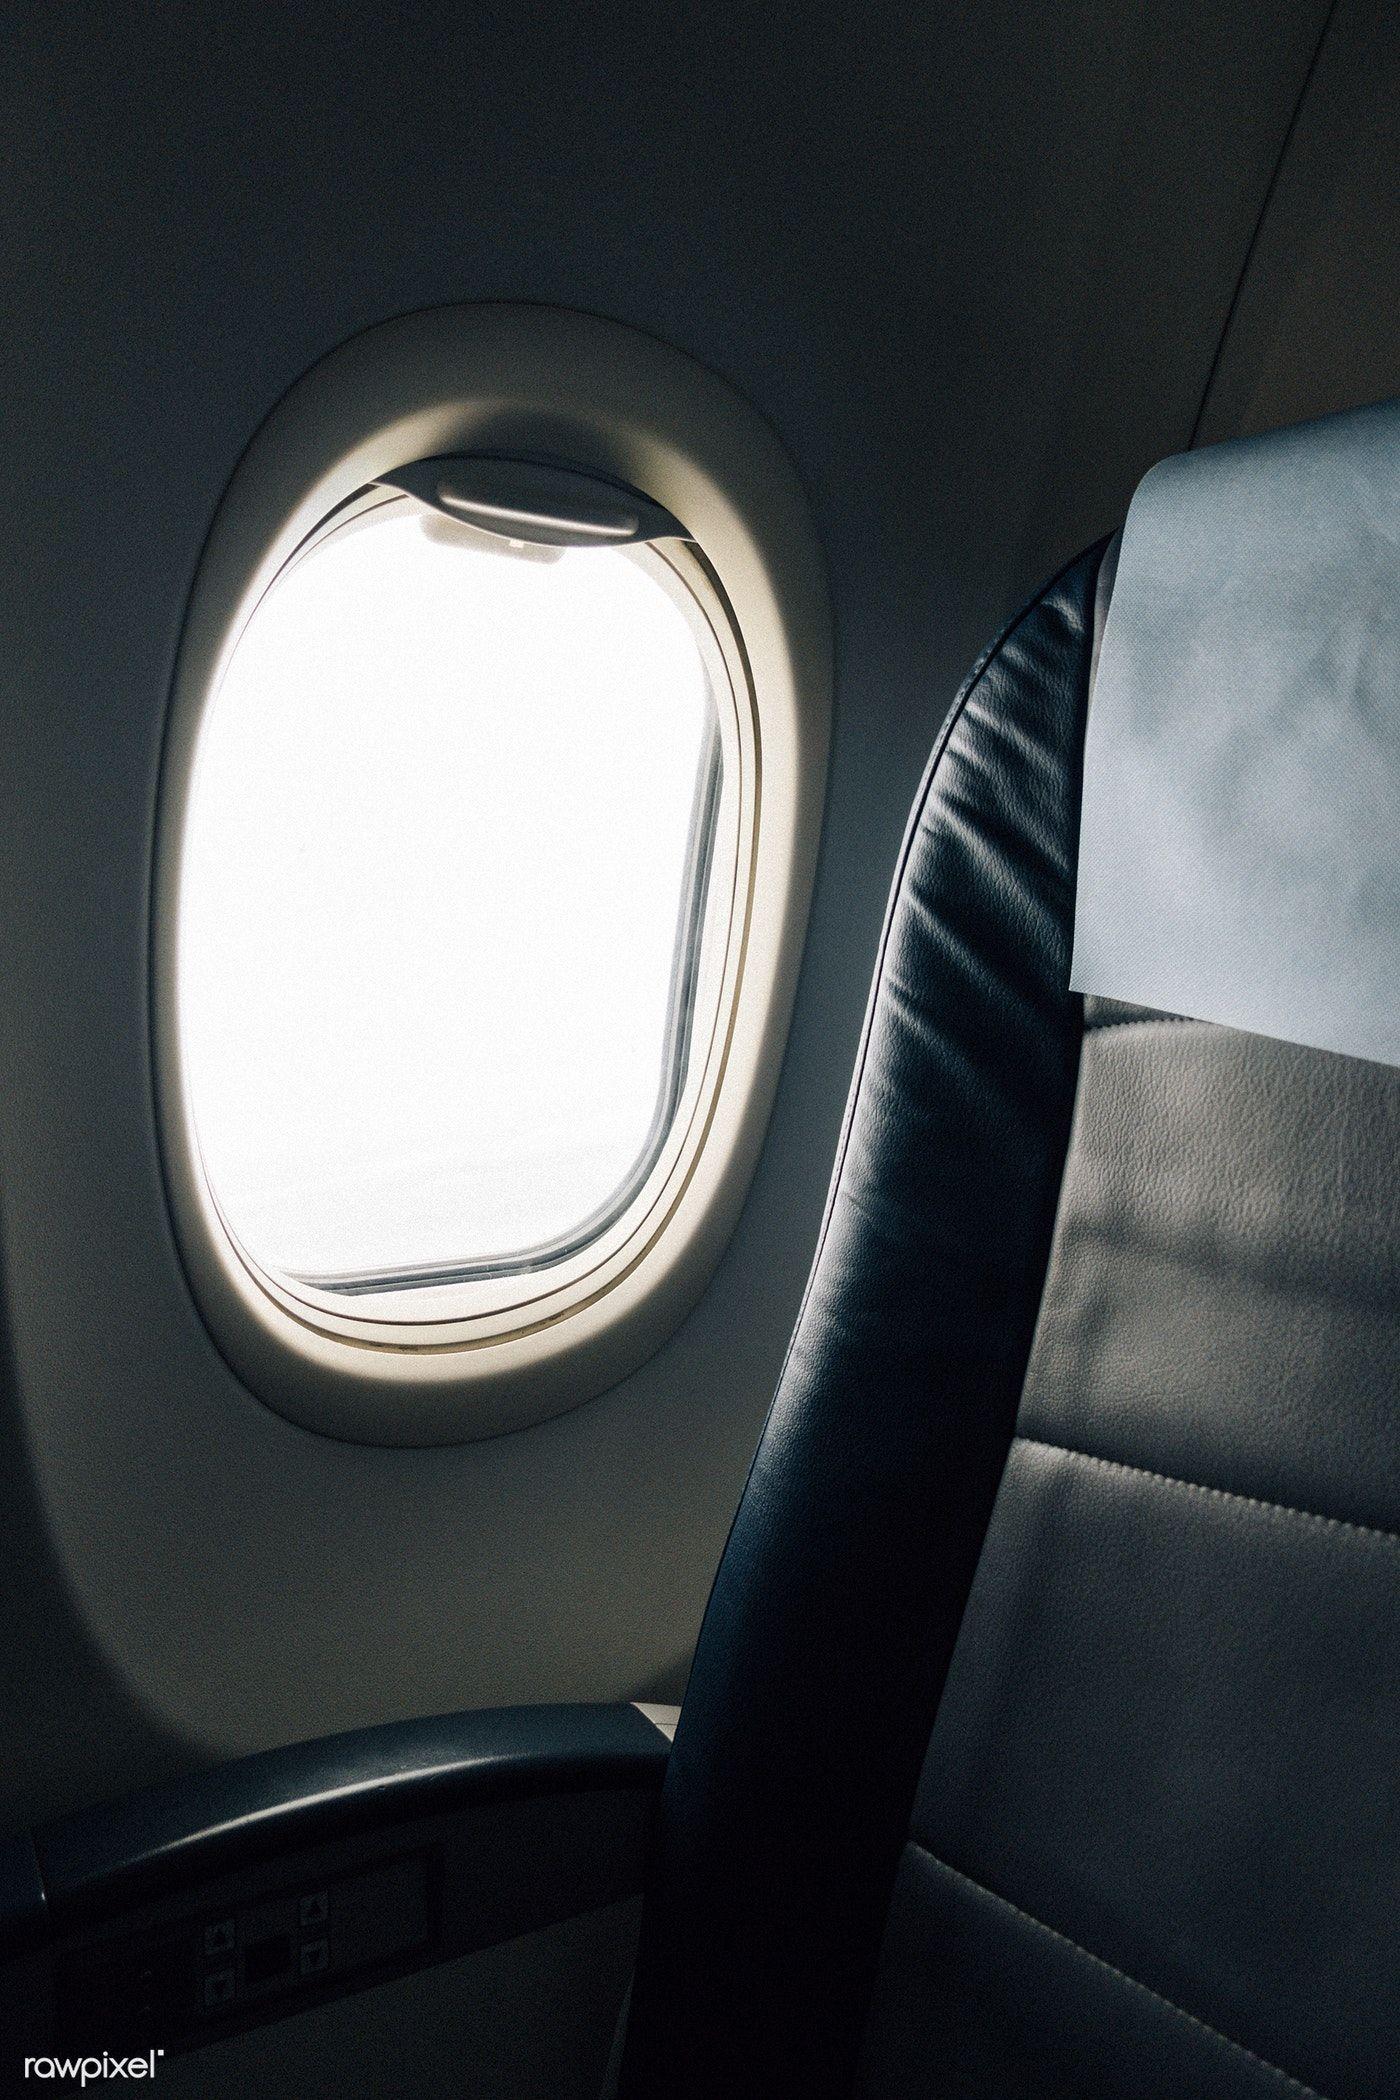 View From The Window Seat Of A Plane Free Image By Rawpixel Com Chanikarn Thongsupa Plane Window Plane Seats Window Seat